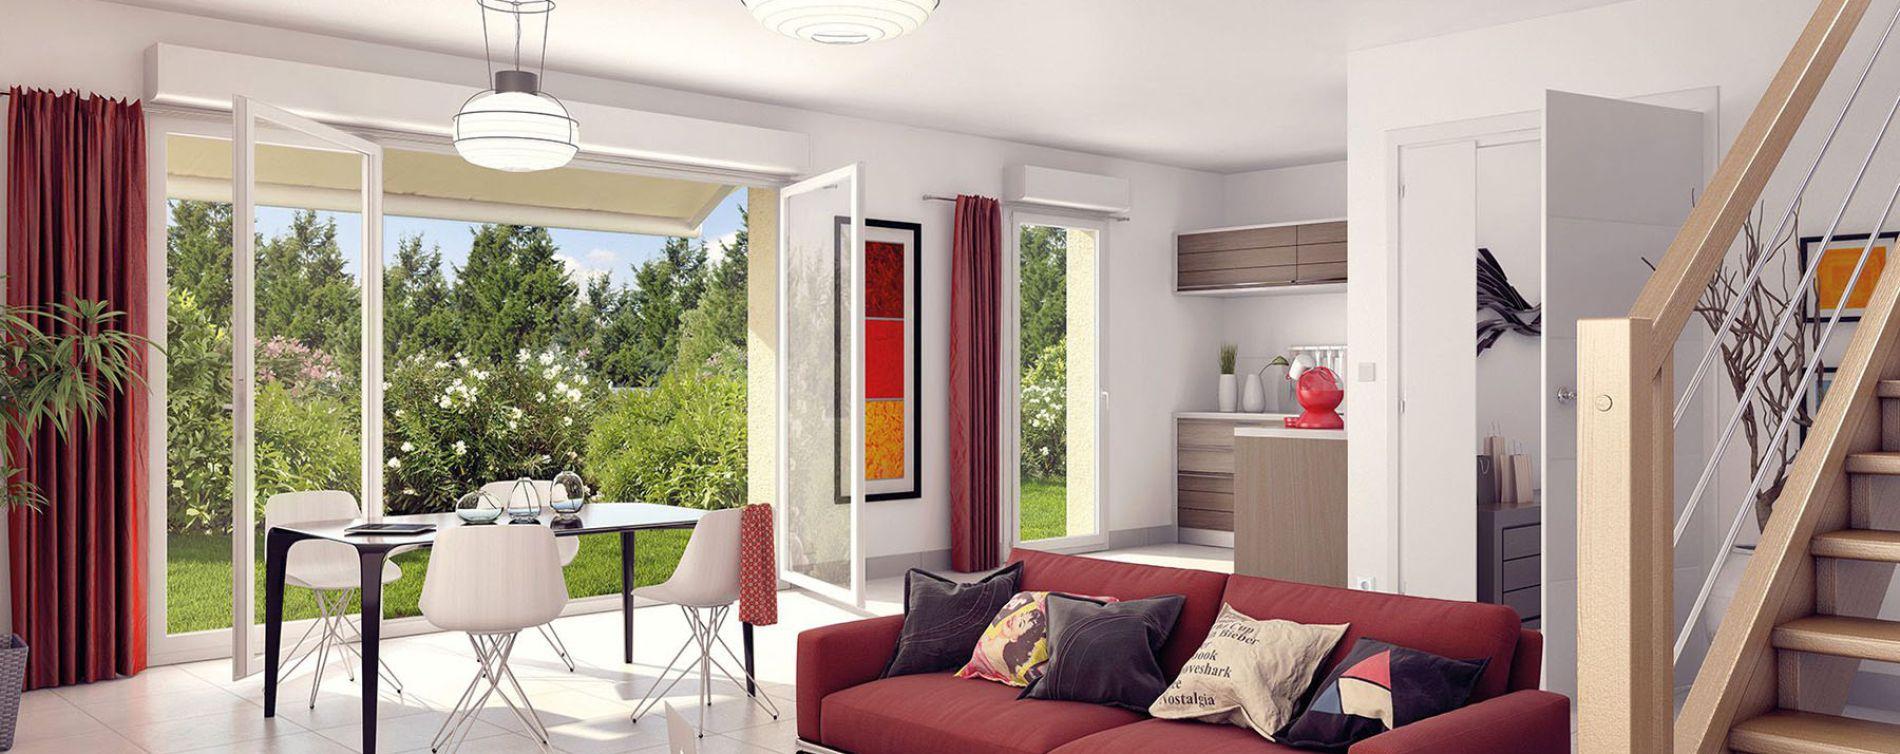 Gries : programme immobilier neuve « Sessilia » (3)